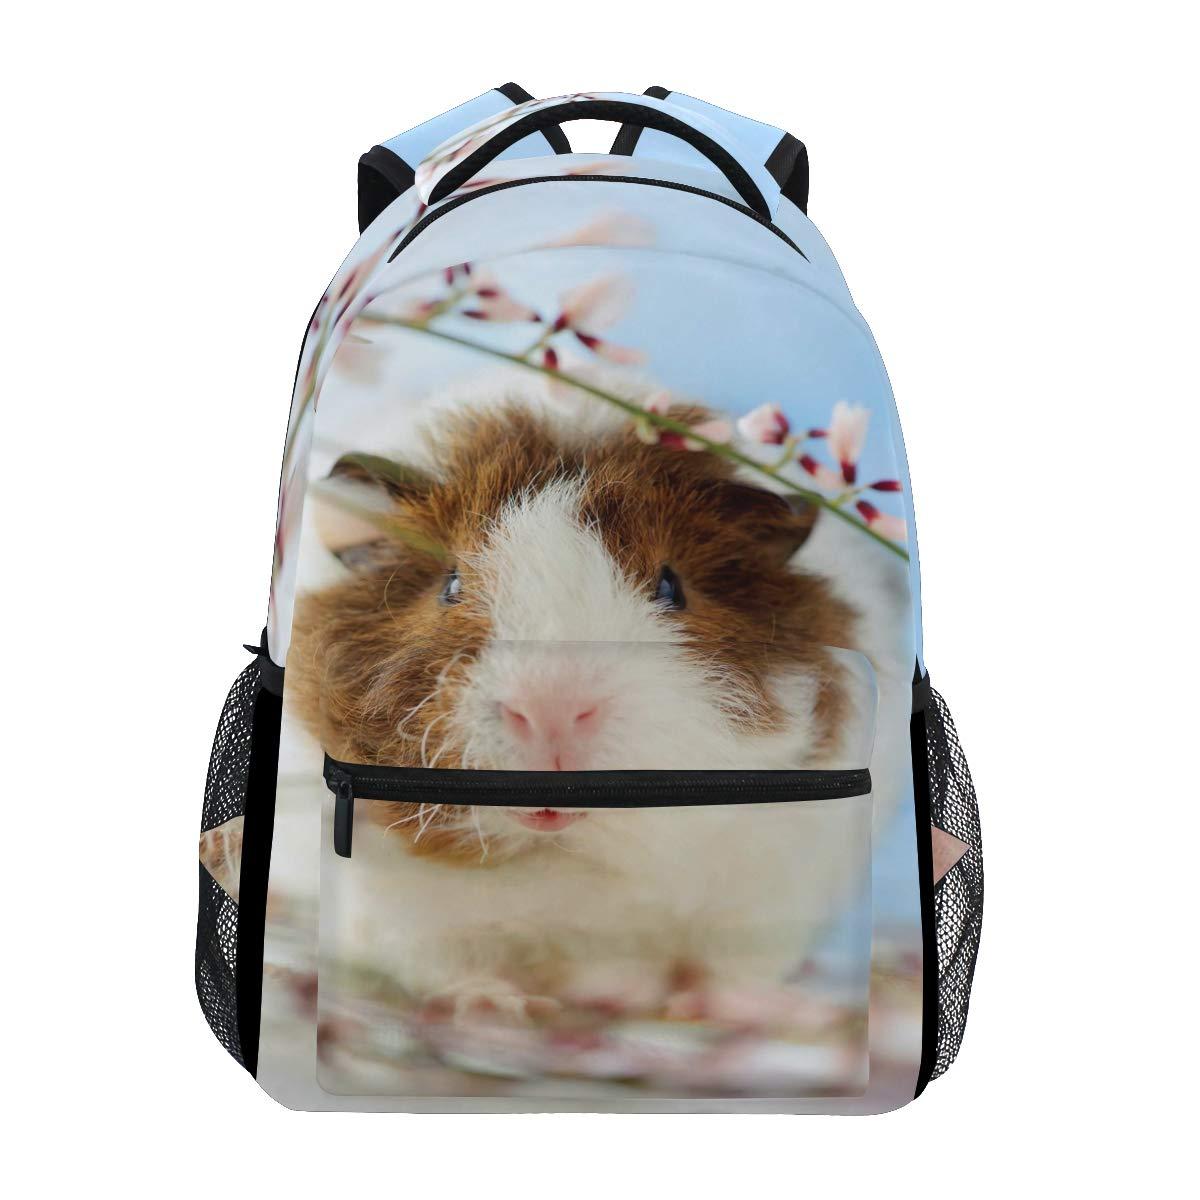 d55b69afa22f Guinea Pig Backpack | Sante Blog